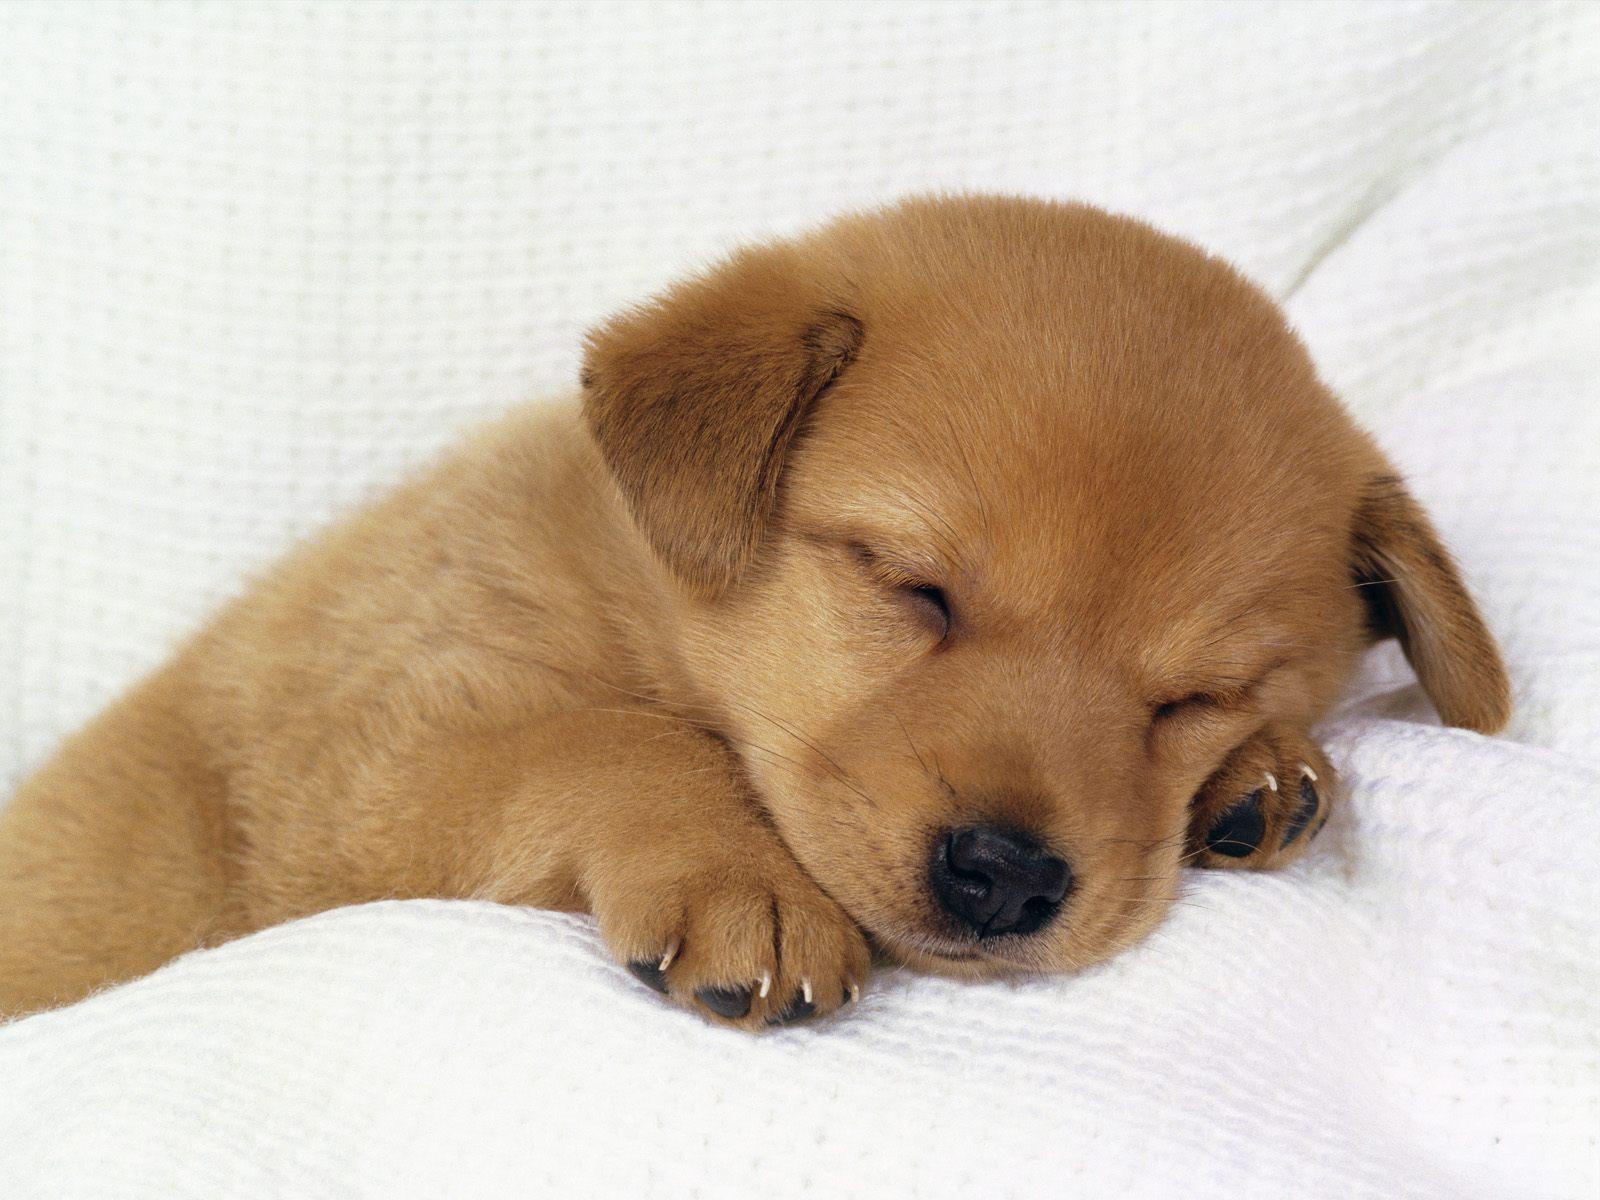 cute puppy wallpaper funny dog wallpaper hd cute dog wallpaper 1600x1200